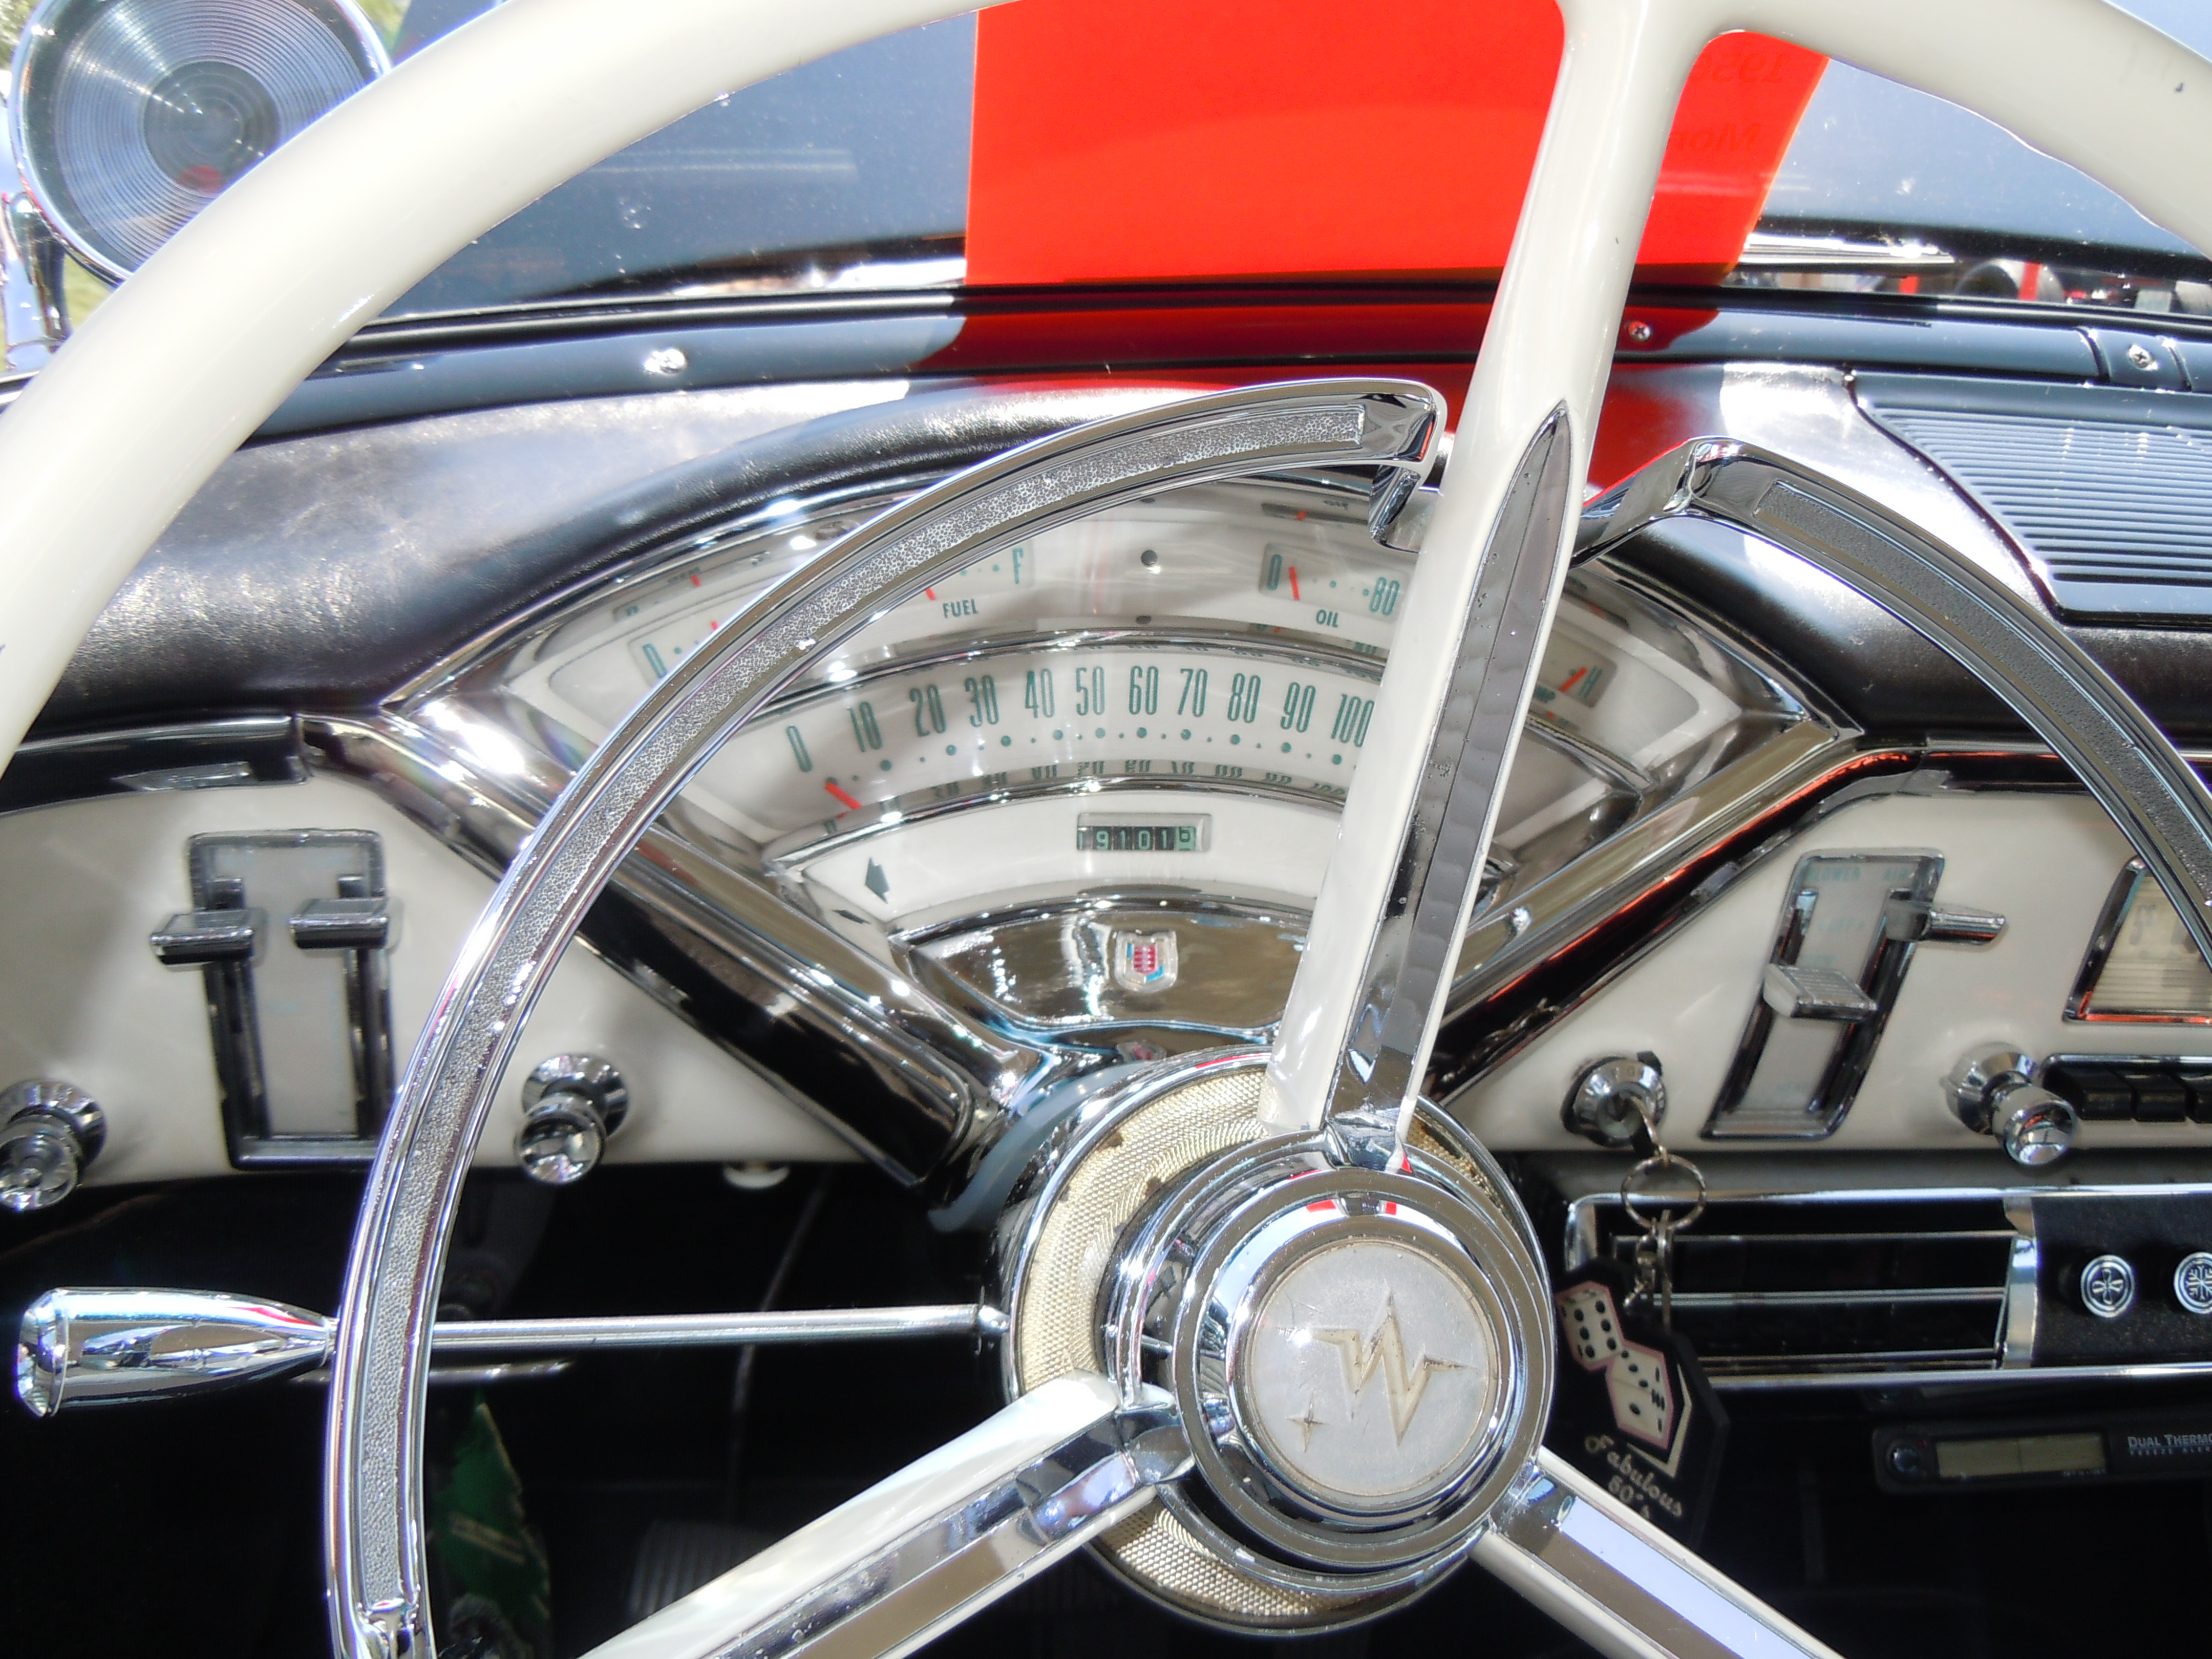 1965 Mercury Dash 56 Montclair Wiring Diagram File Tier Wikimedia Commons 4320x3240